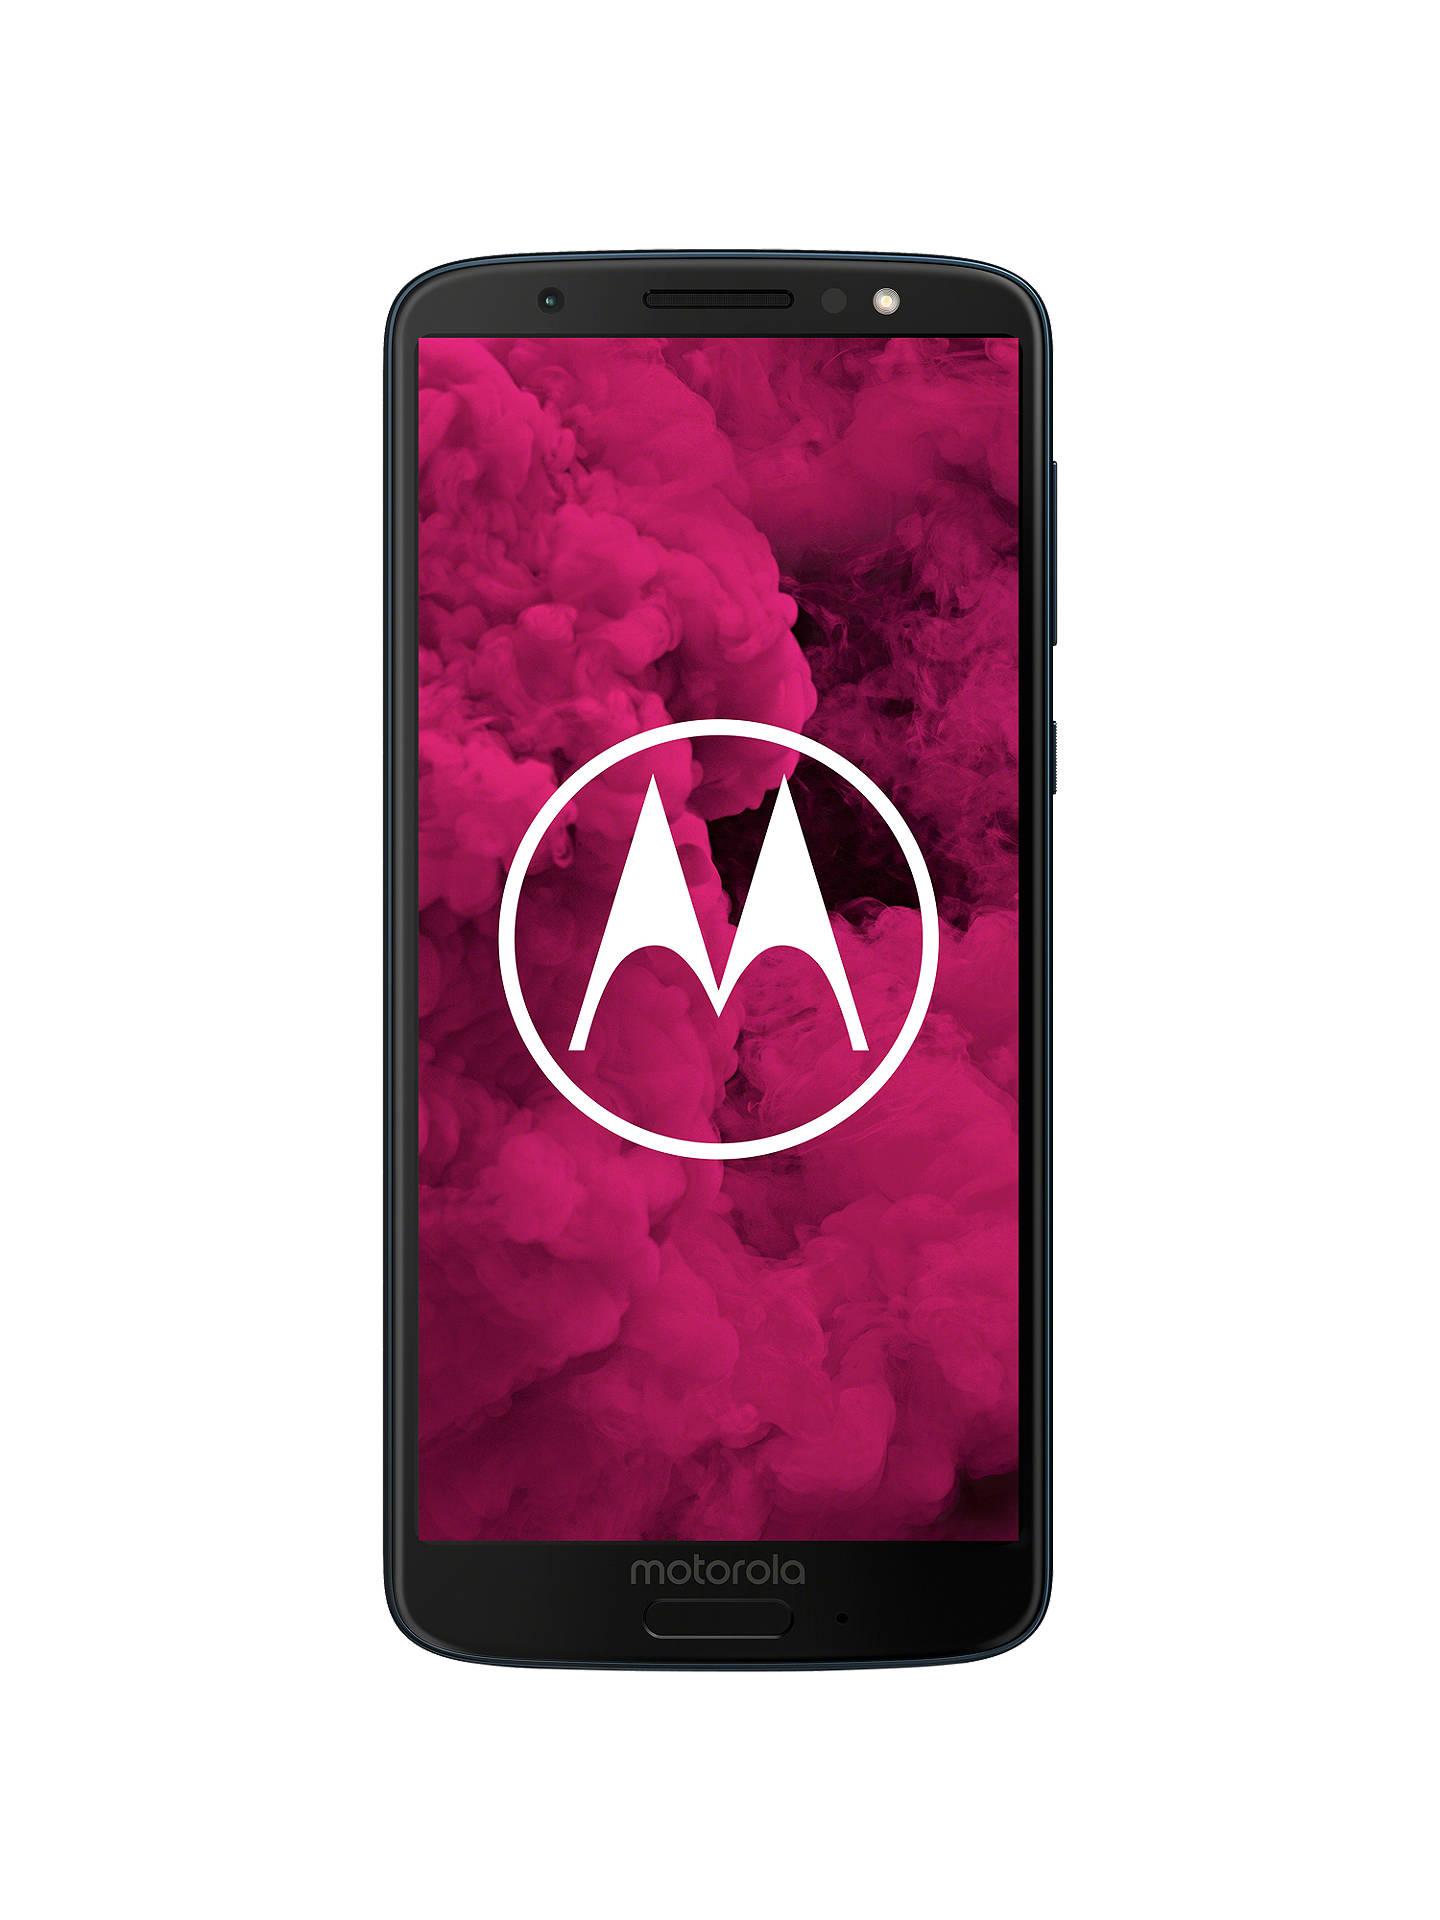 Motorola g6 Dual SIM Smartphone, Android, 5 7